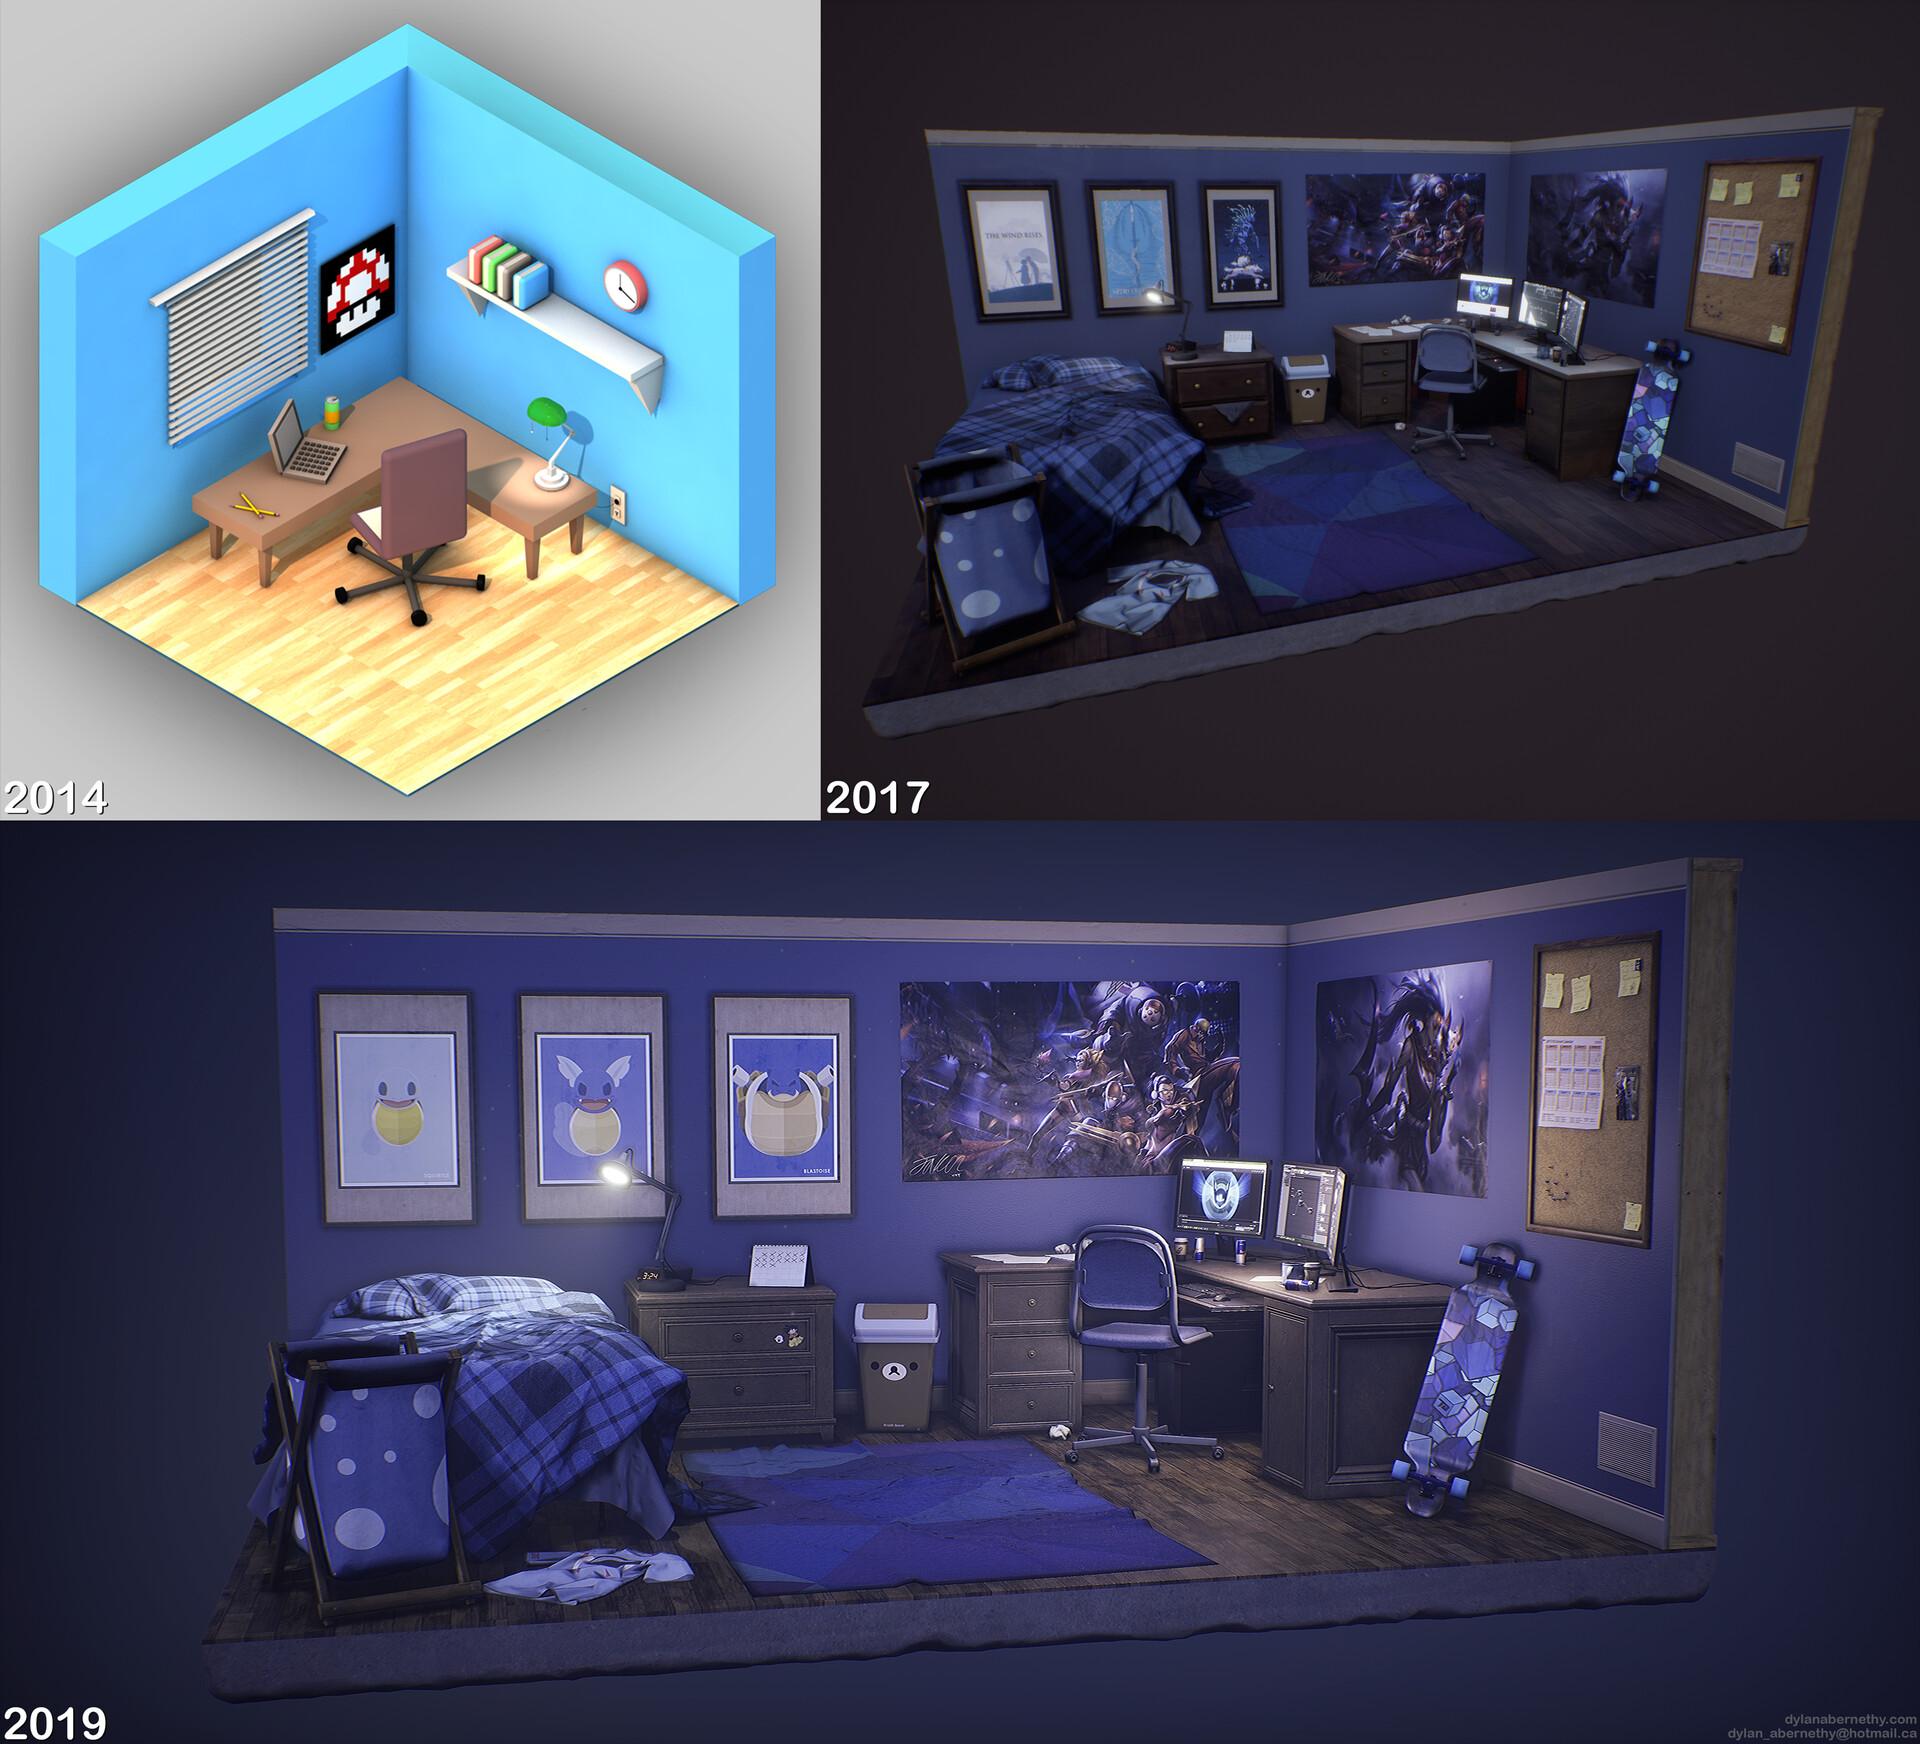 Progress over the years